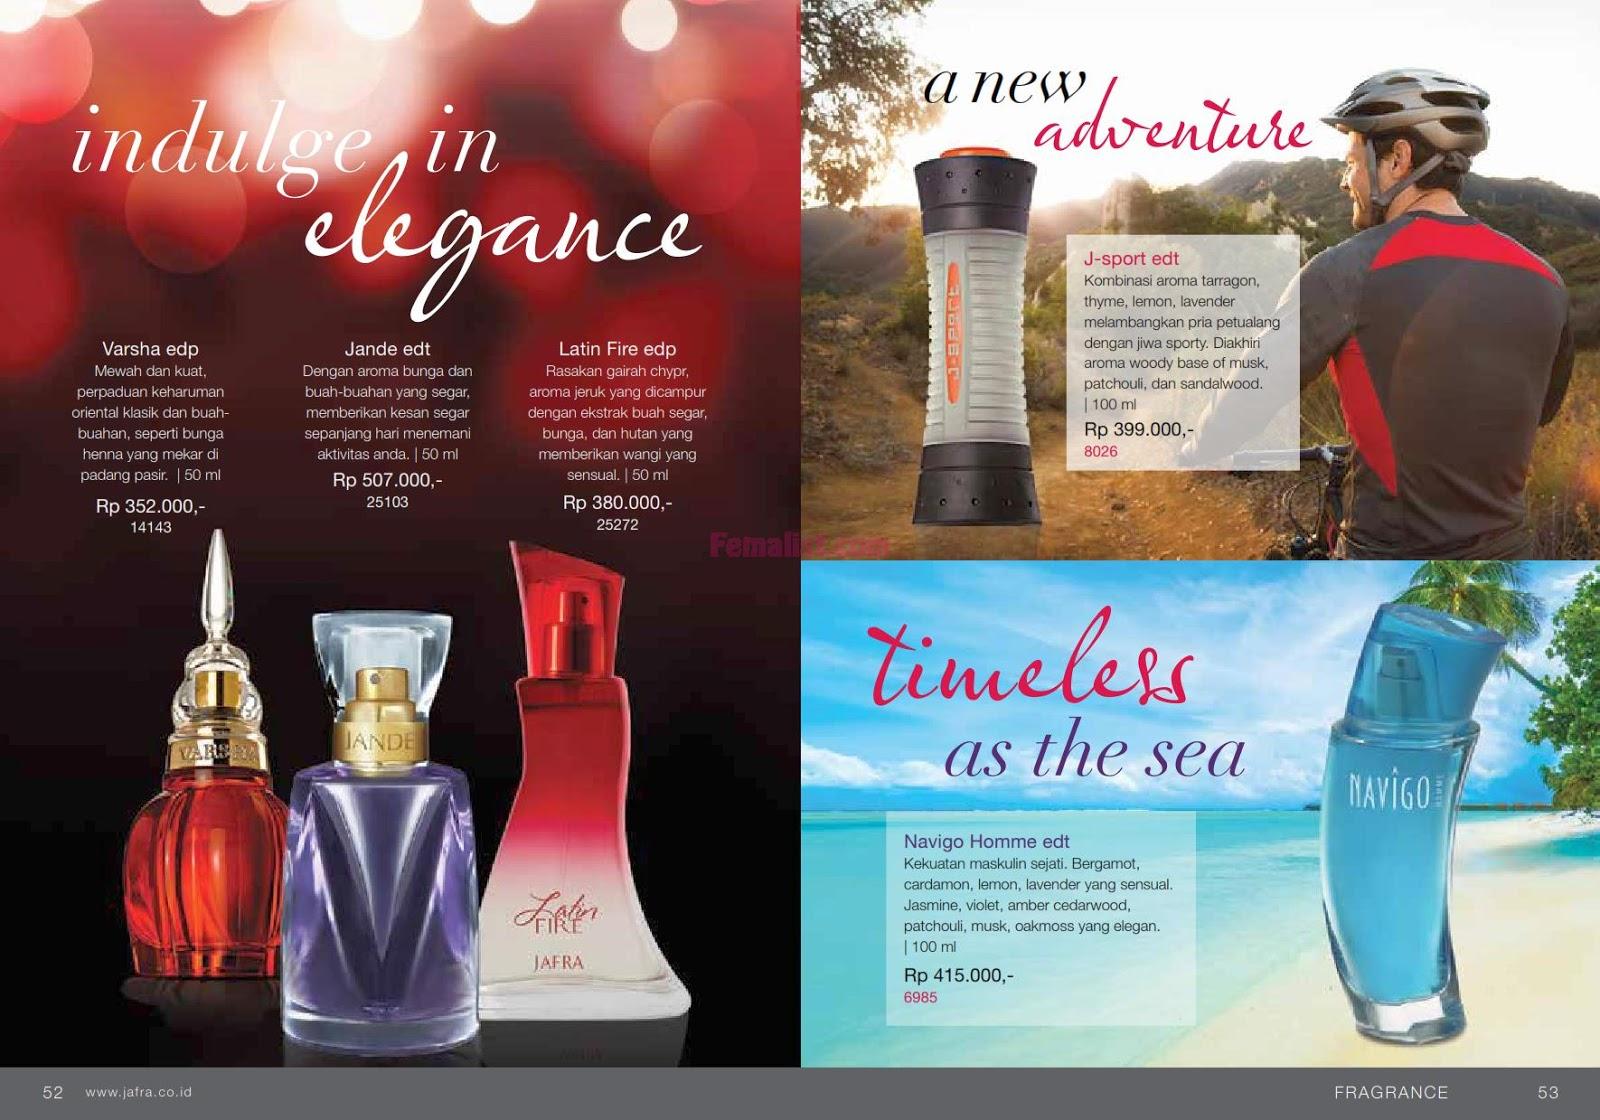 Katalog 172 Harga Produk Jafra Kosmetik Skin Care Indonesia 2018 Gentleman Edt 100ml Parfum